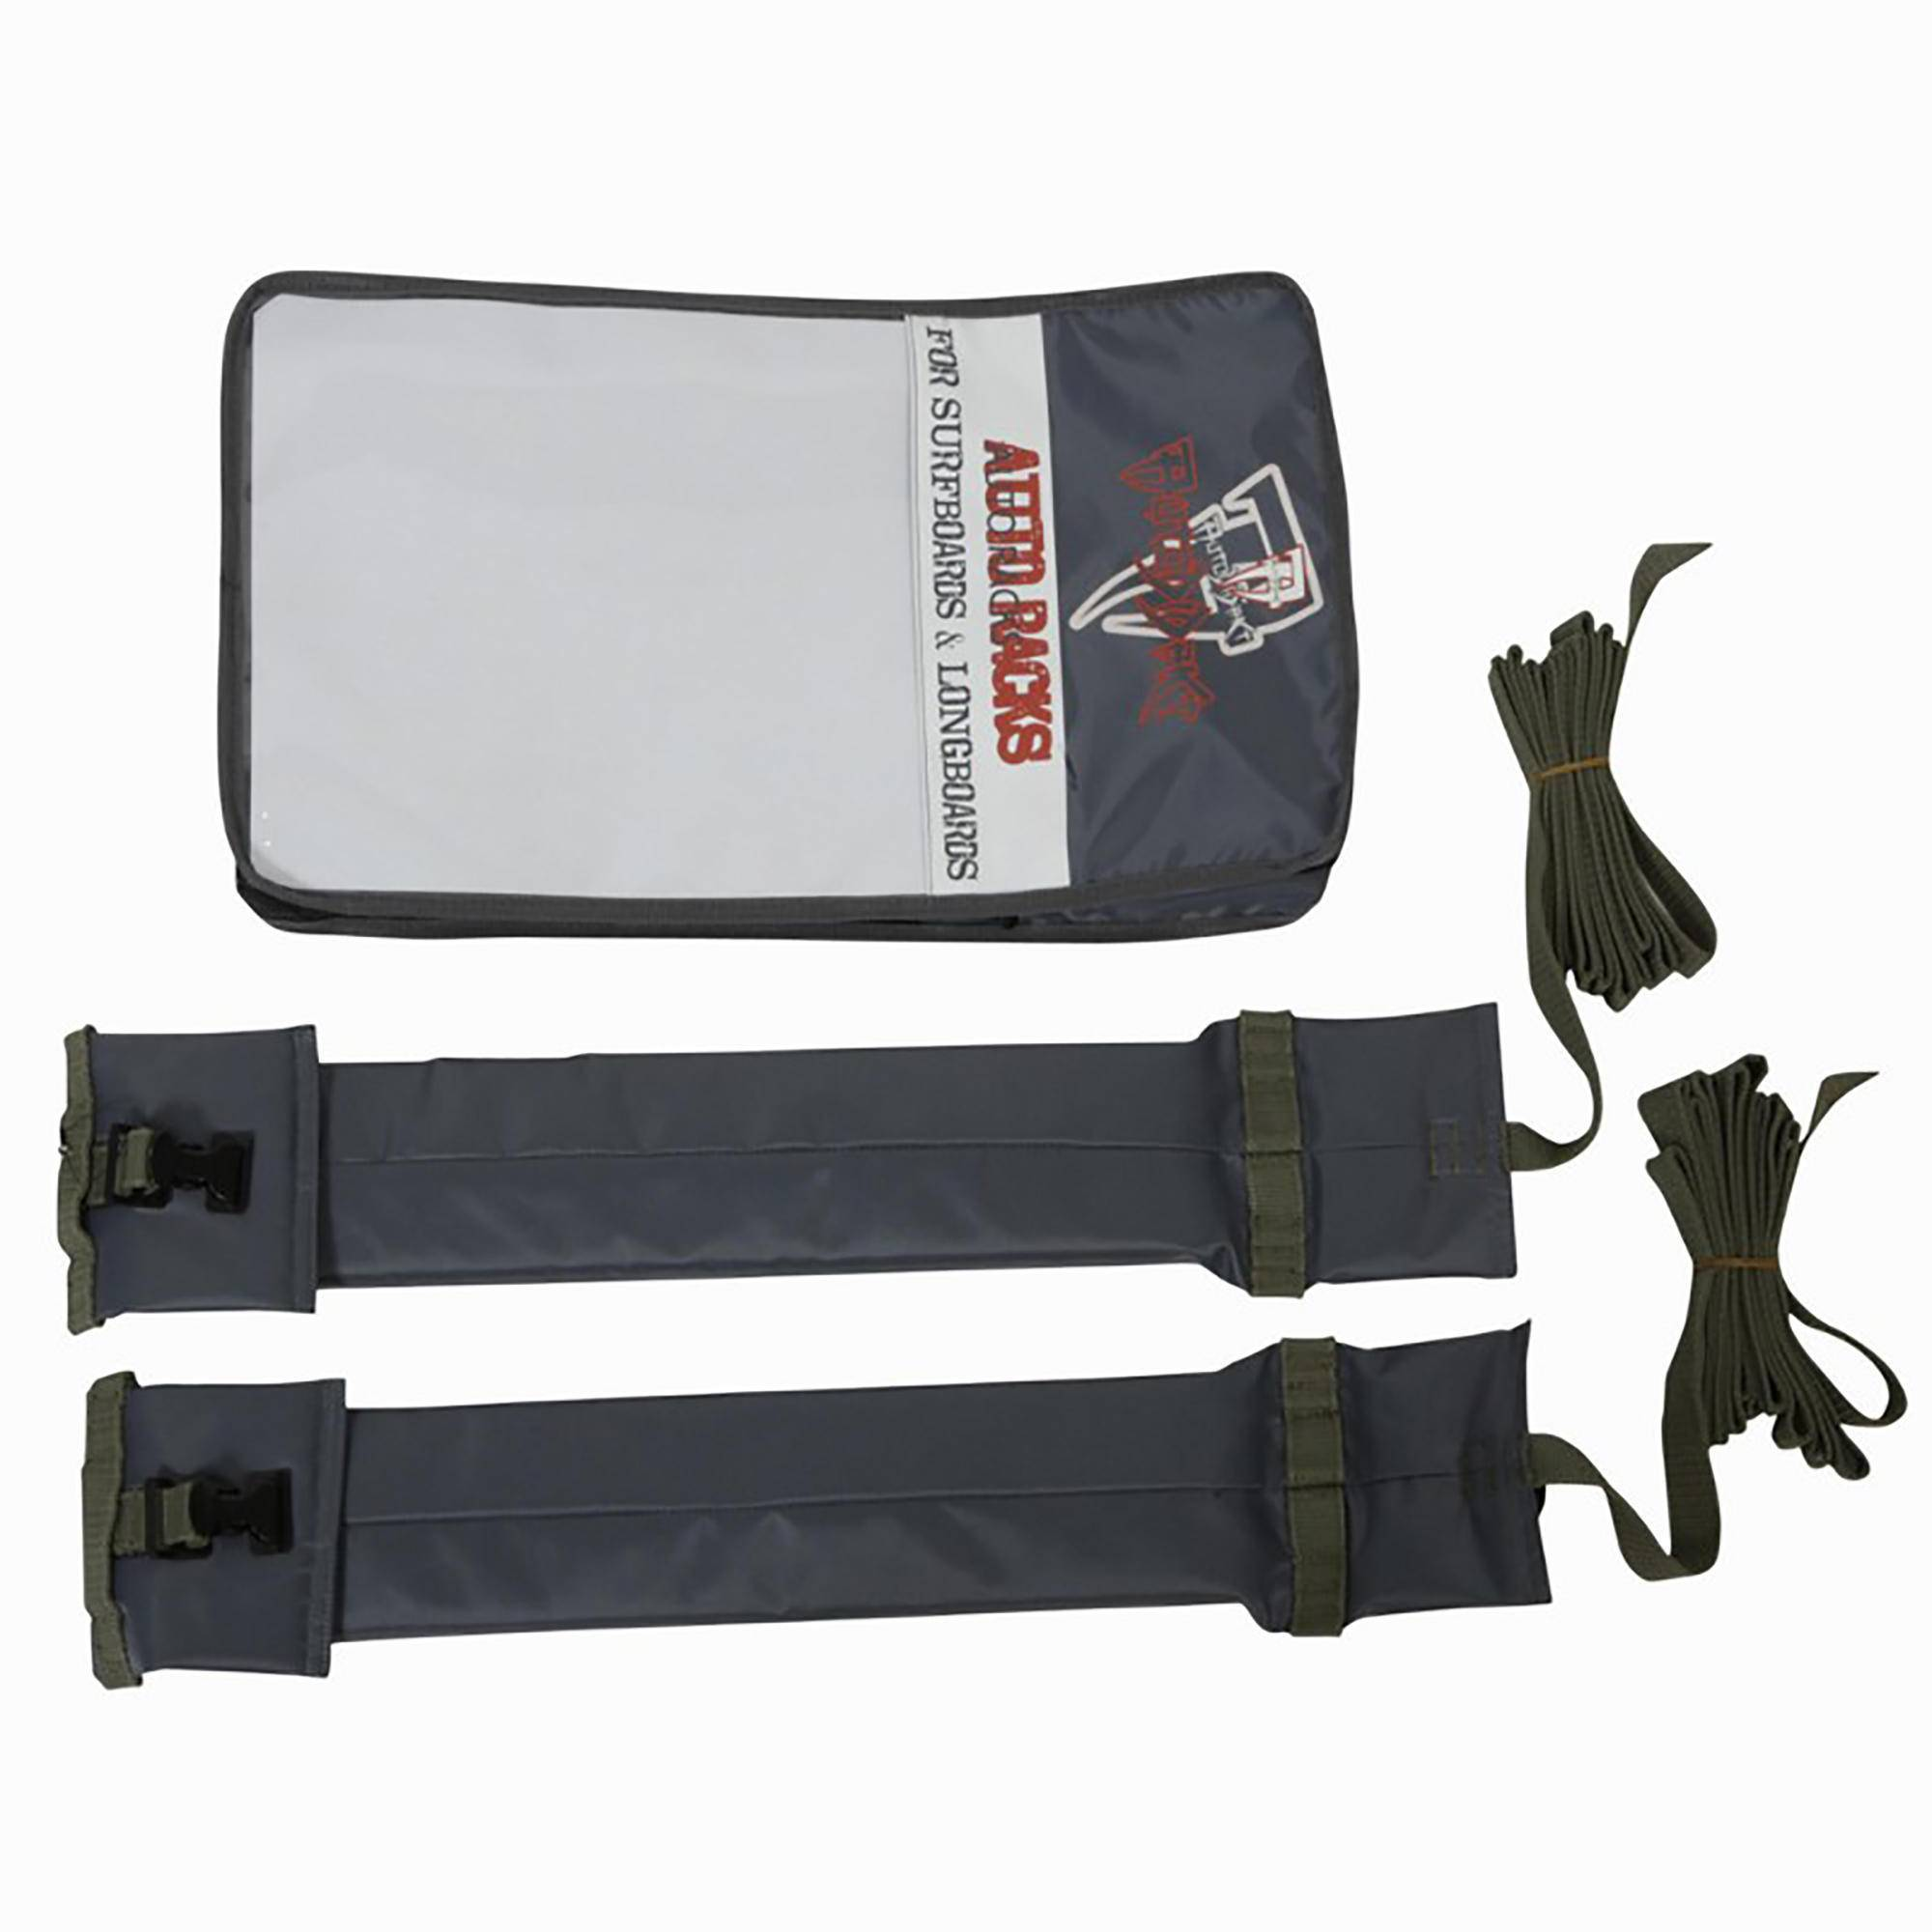 SURFSYSTEM Portapacchi flessibile per 1 tavola surf